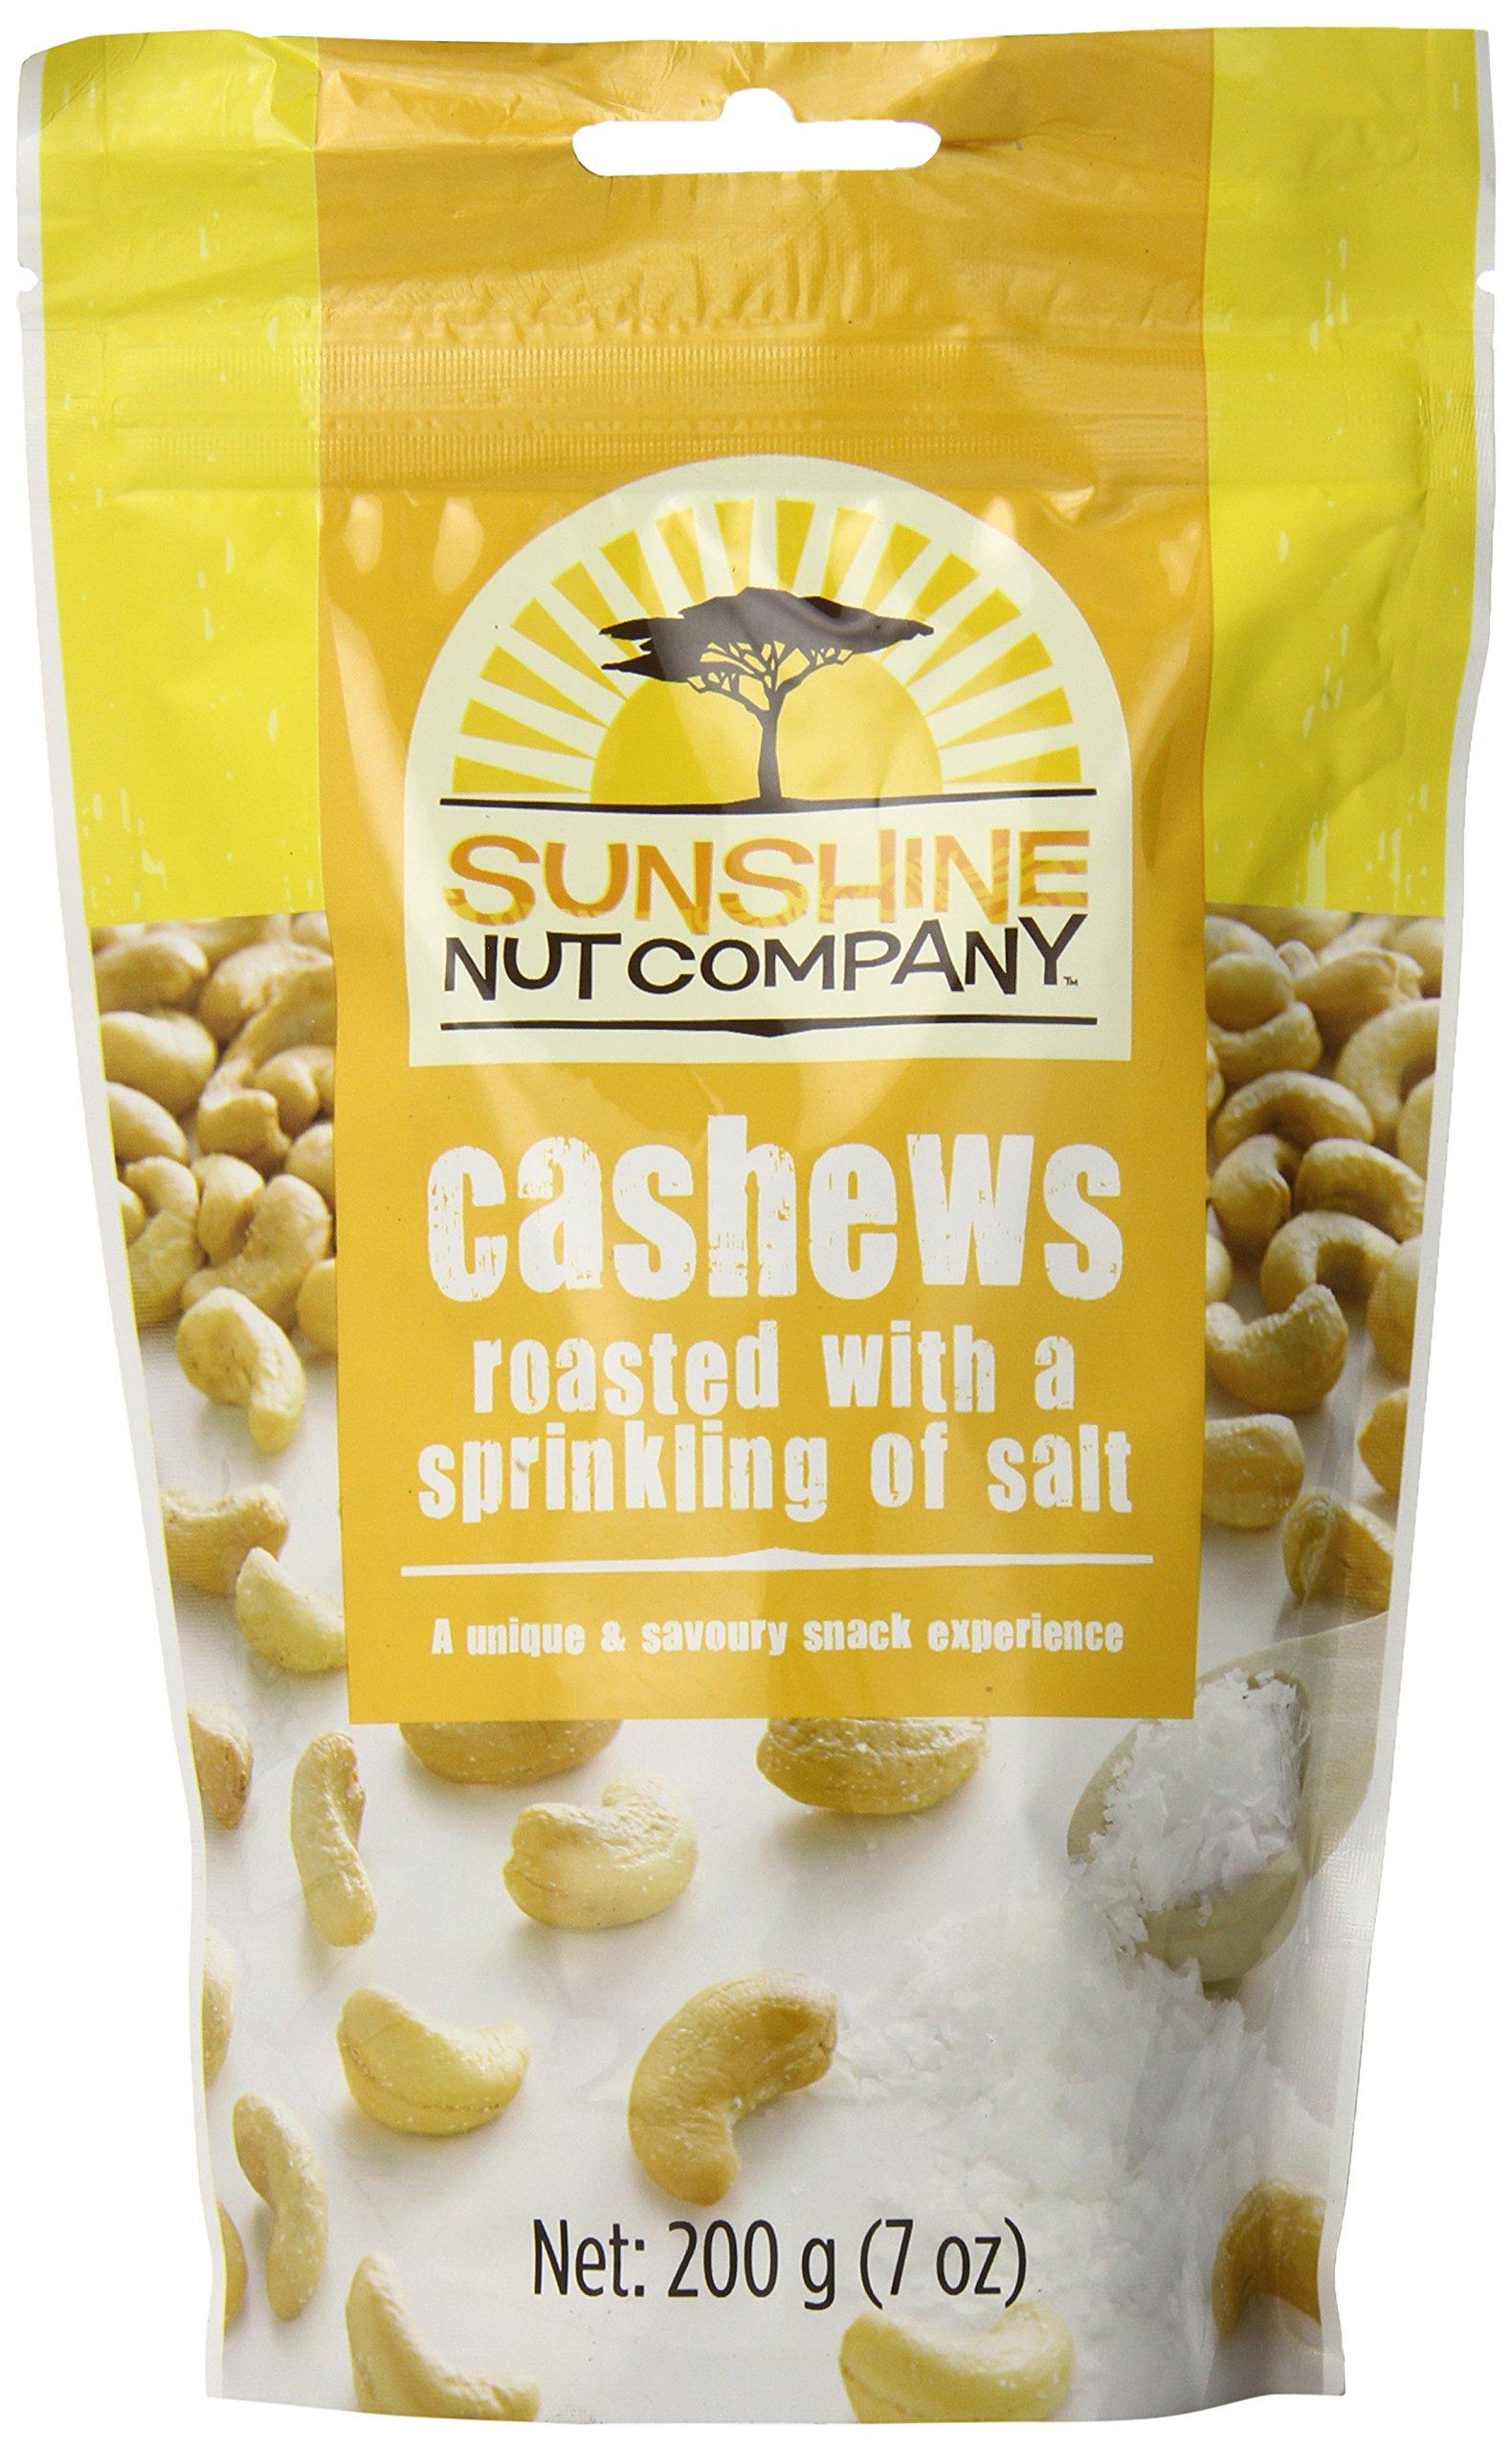 Sunshine Nut Company Cashews Roasted with a Sprinkling of Salt, 7 Ounce (Pack of 12)